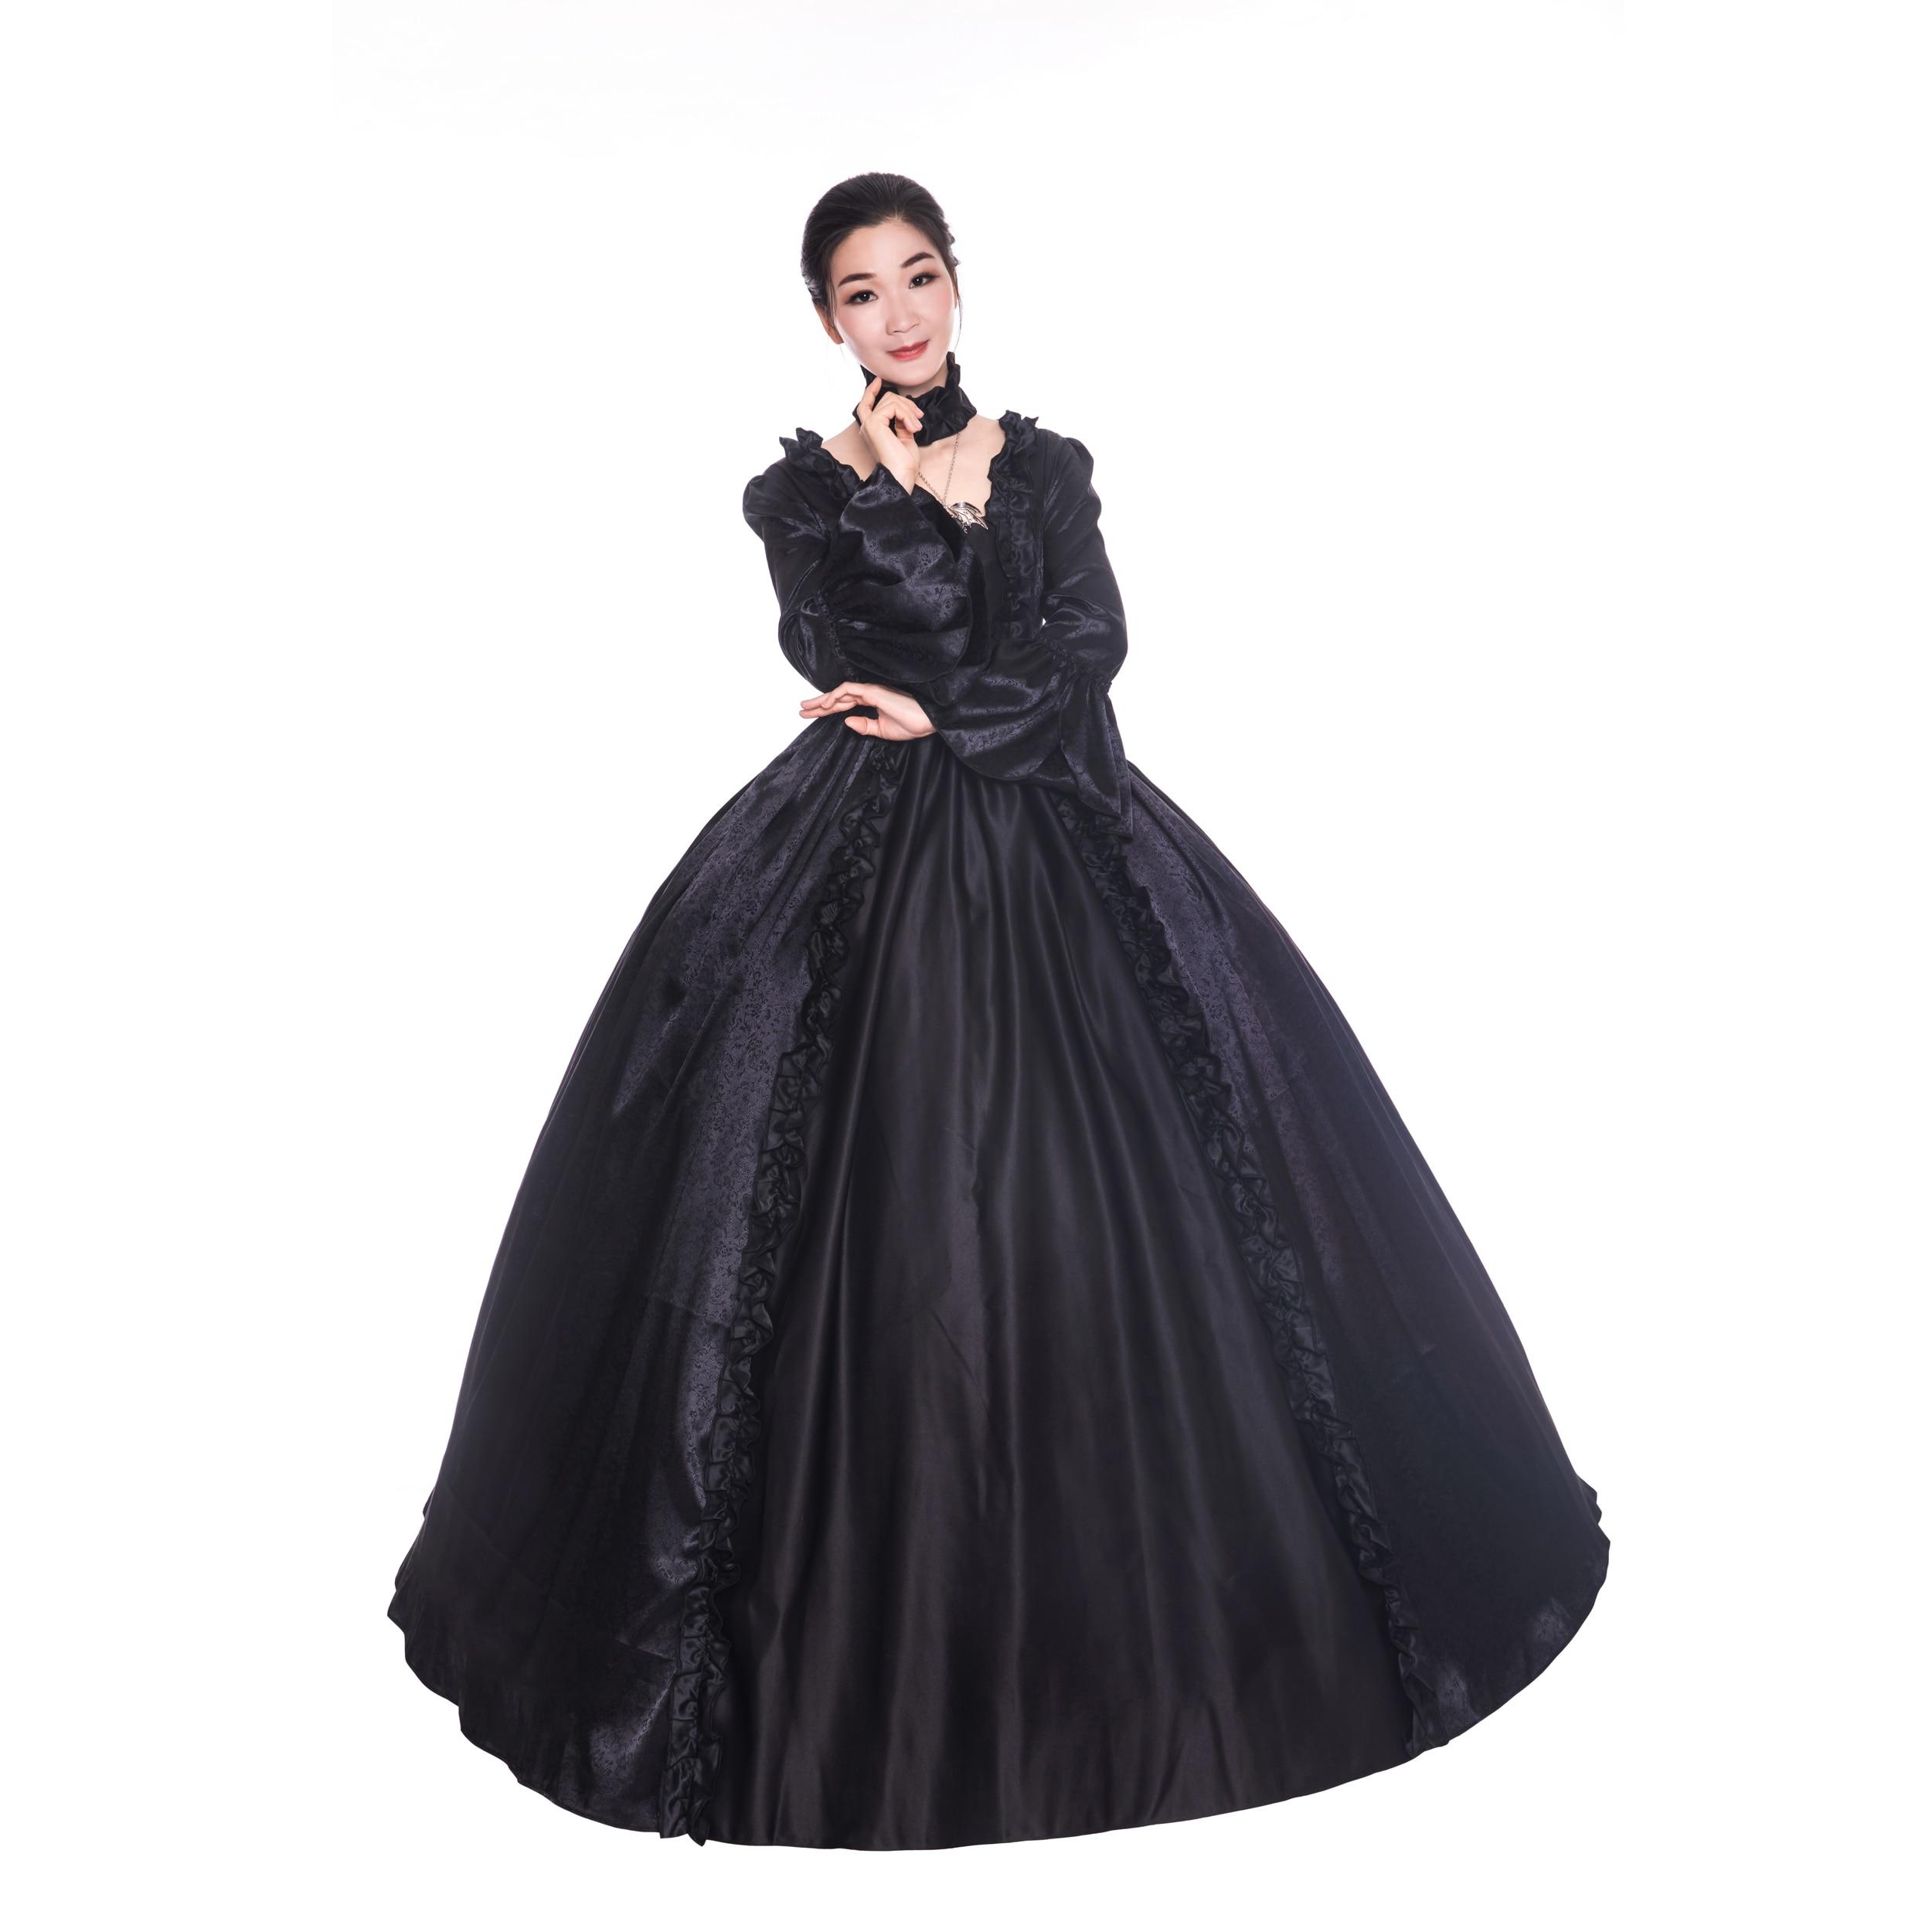 Renaissance Gothic Dark Queen Ball Gown Dress Theater Steampunk Cosplay Punk 119